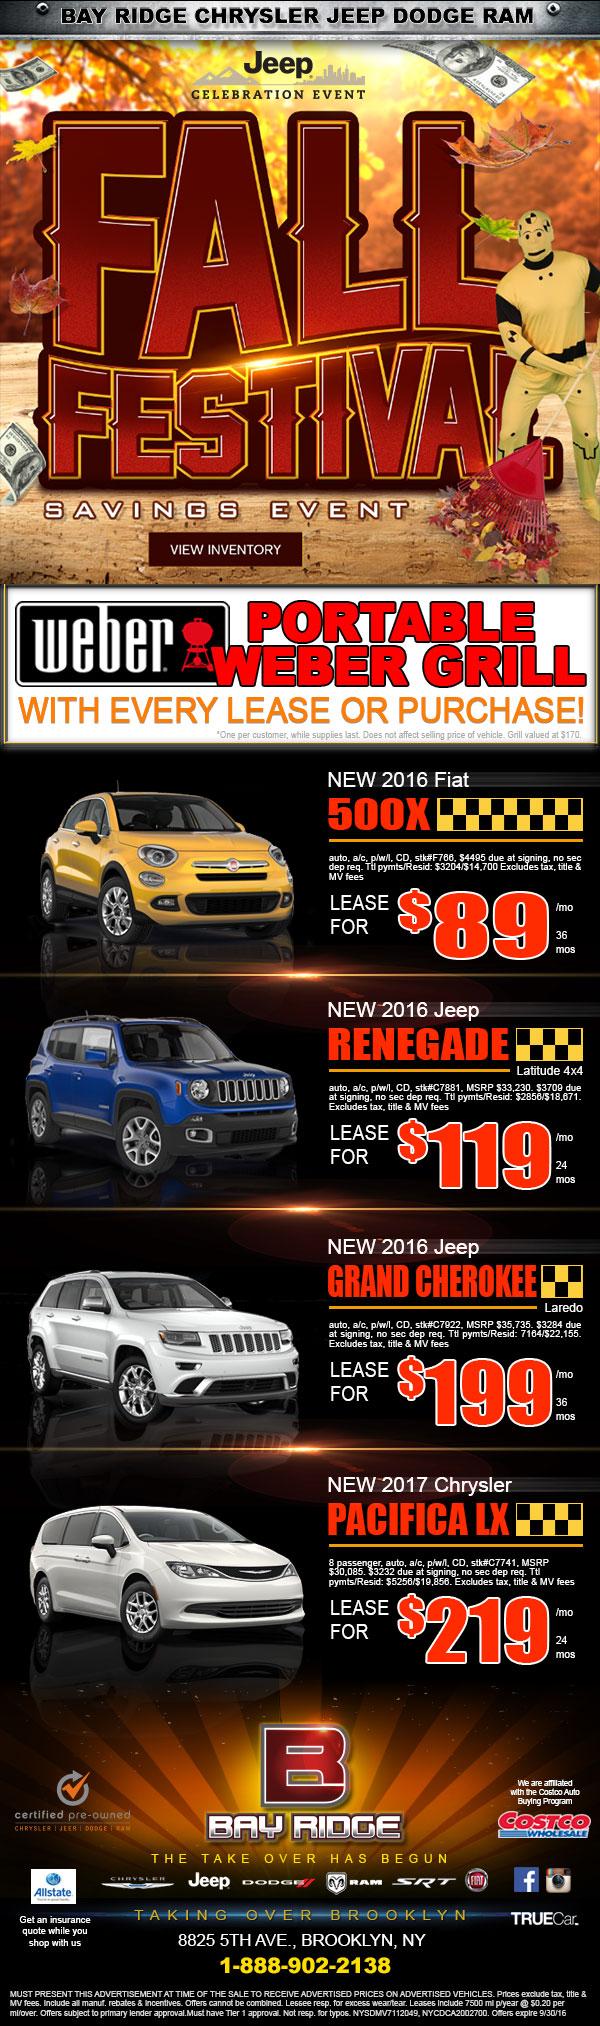 Bay Ridge Jeep : ridge, Festival, Ridge, Auto., Brooklyn,, York), Dealer, Financing, Options, Available., Chrysler, Dodge, Jeep,, Chrysler,